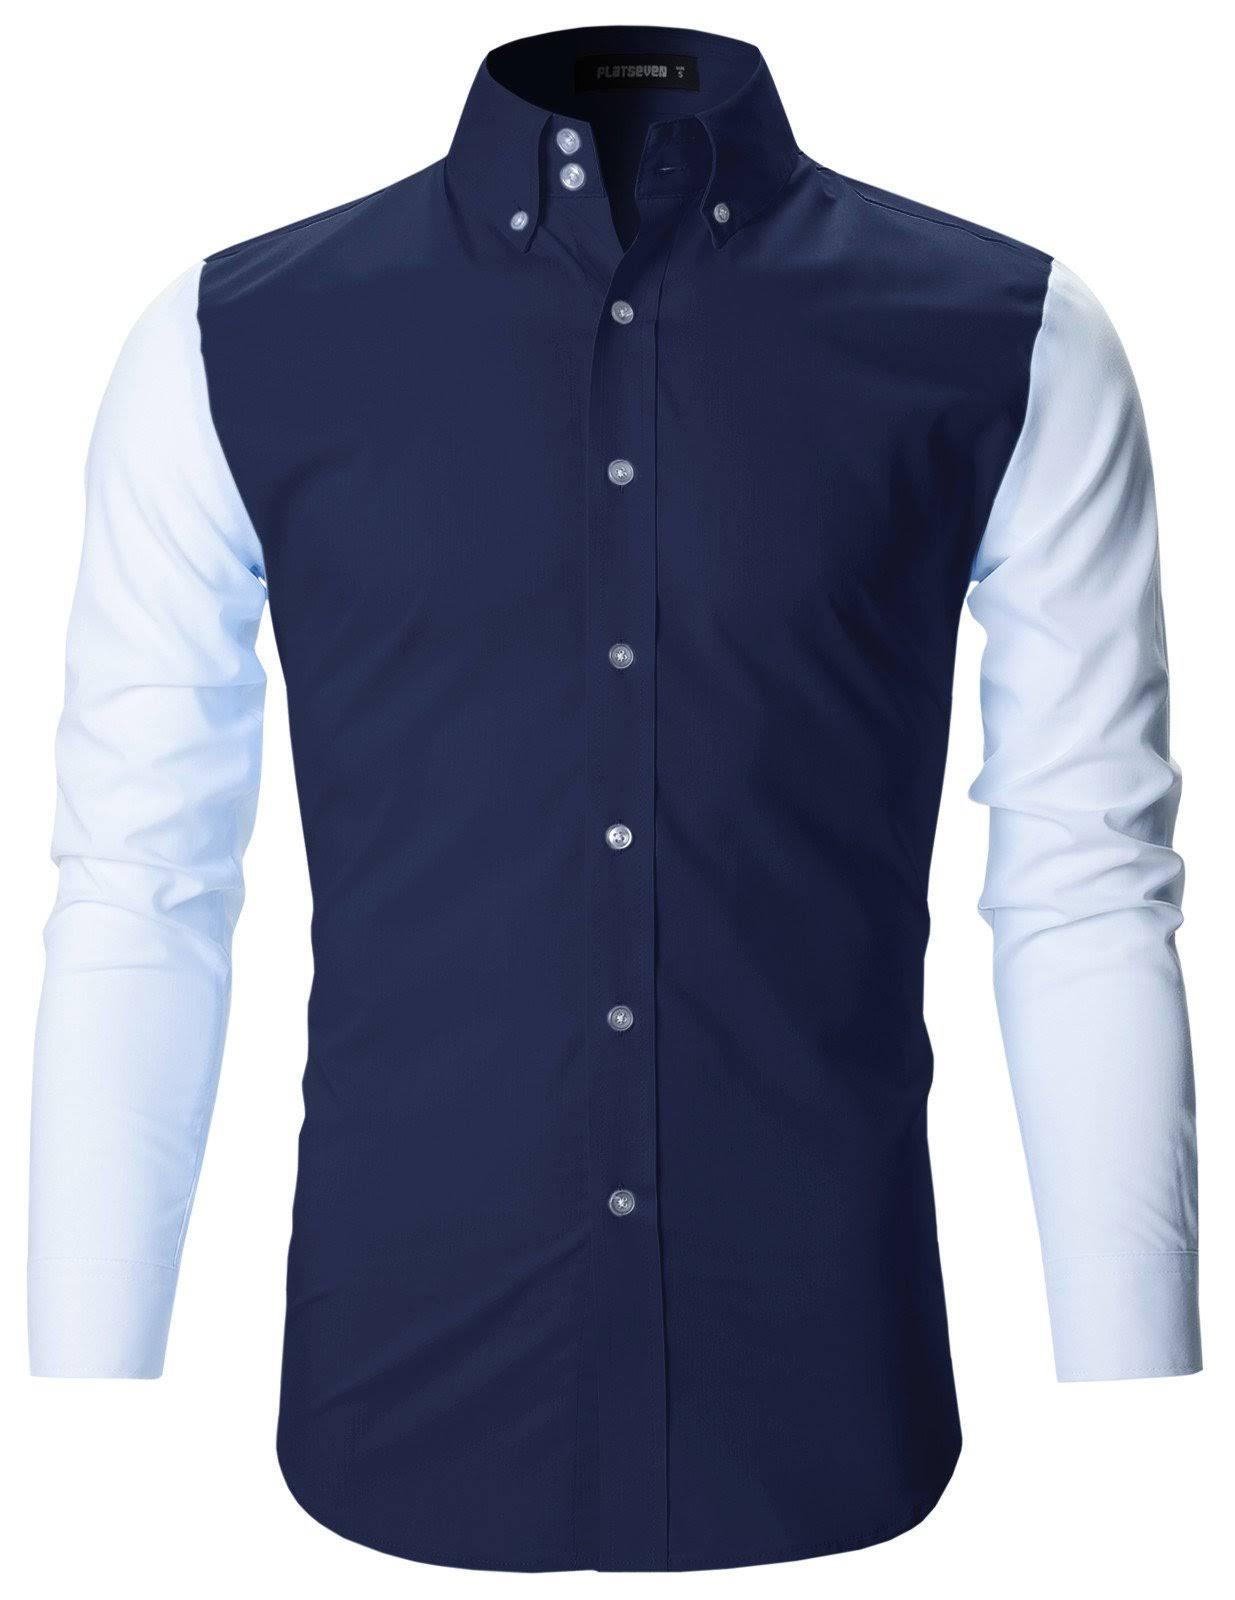 Hombre Fit Slim Camisas Premium Flatseven Casuales dnzOad